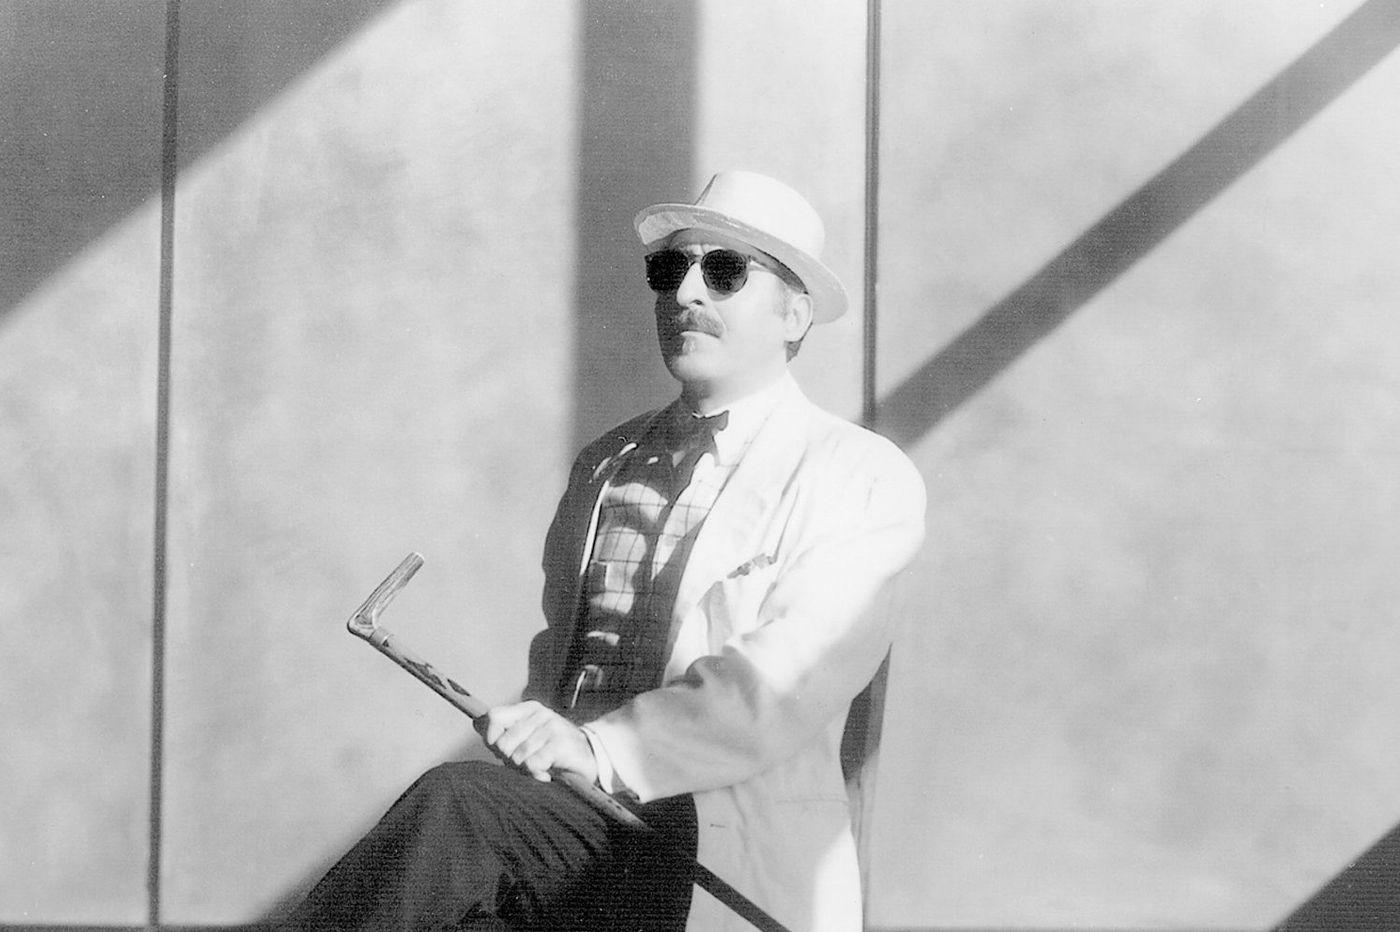 Leon Redbone, acclaimed 1970s musician, dies in New Hope